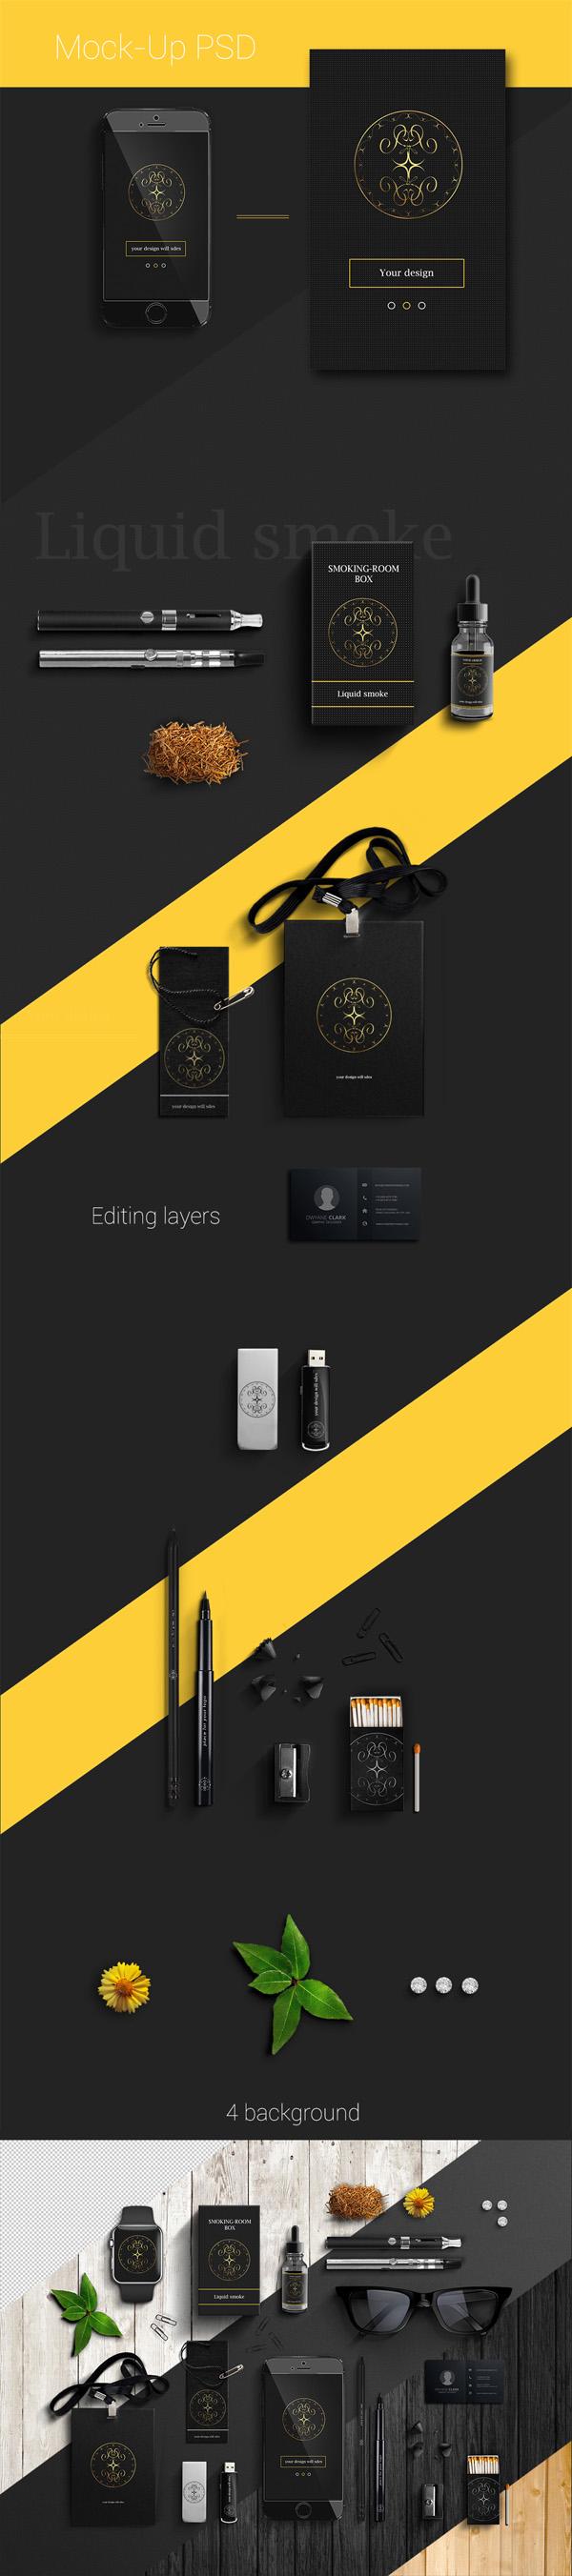 Free Office Branding Mockup